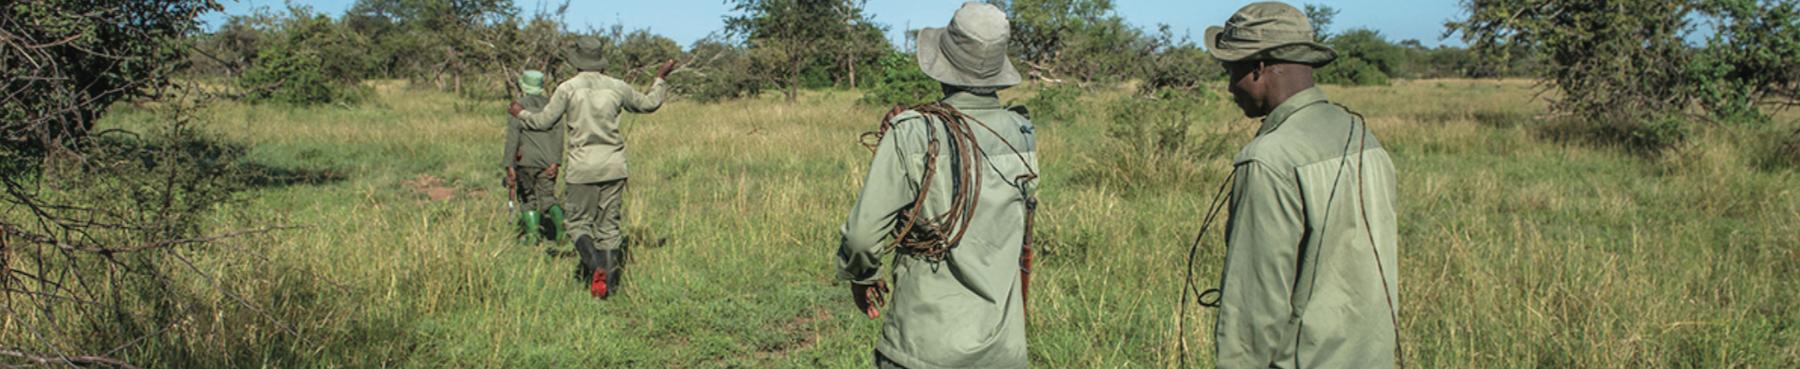 field_team_park_rangers_serengeti.png